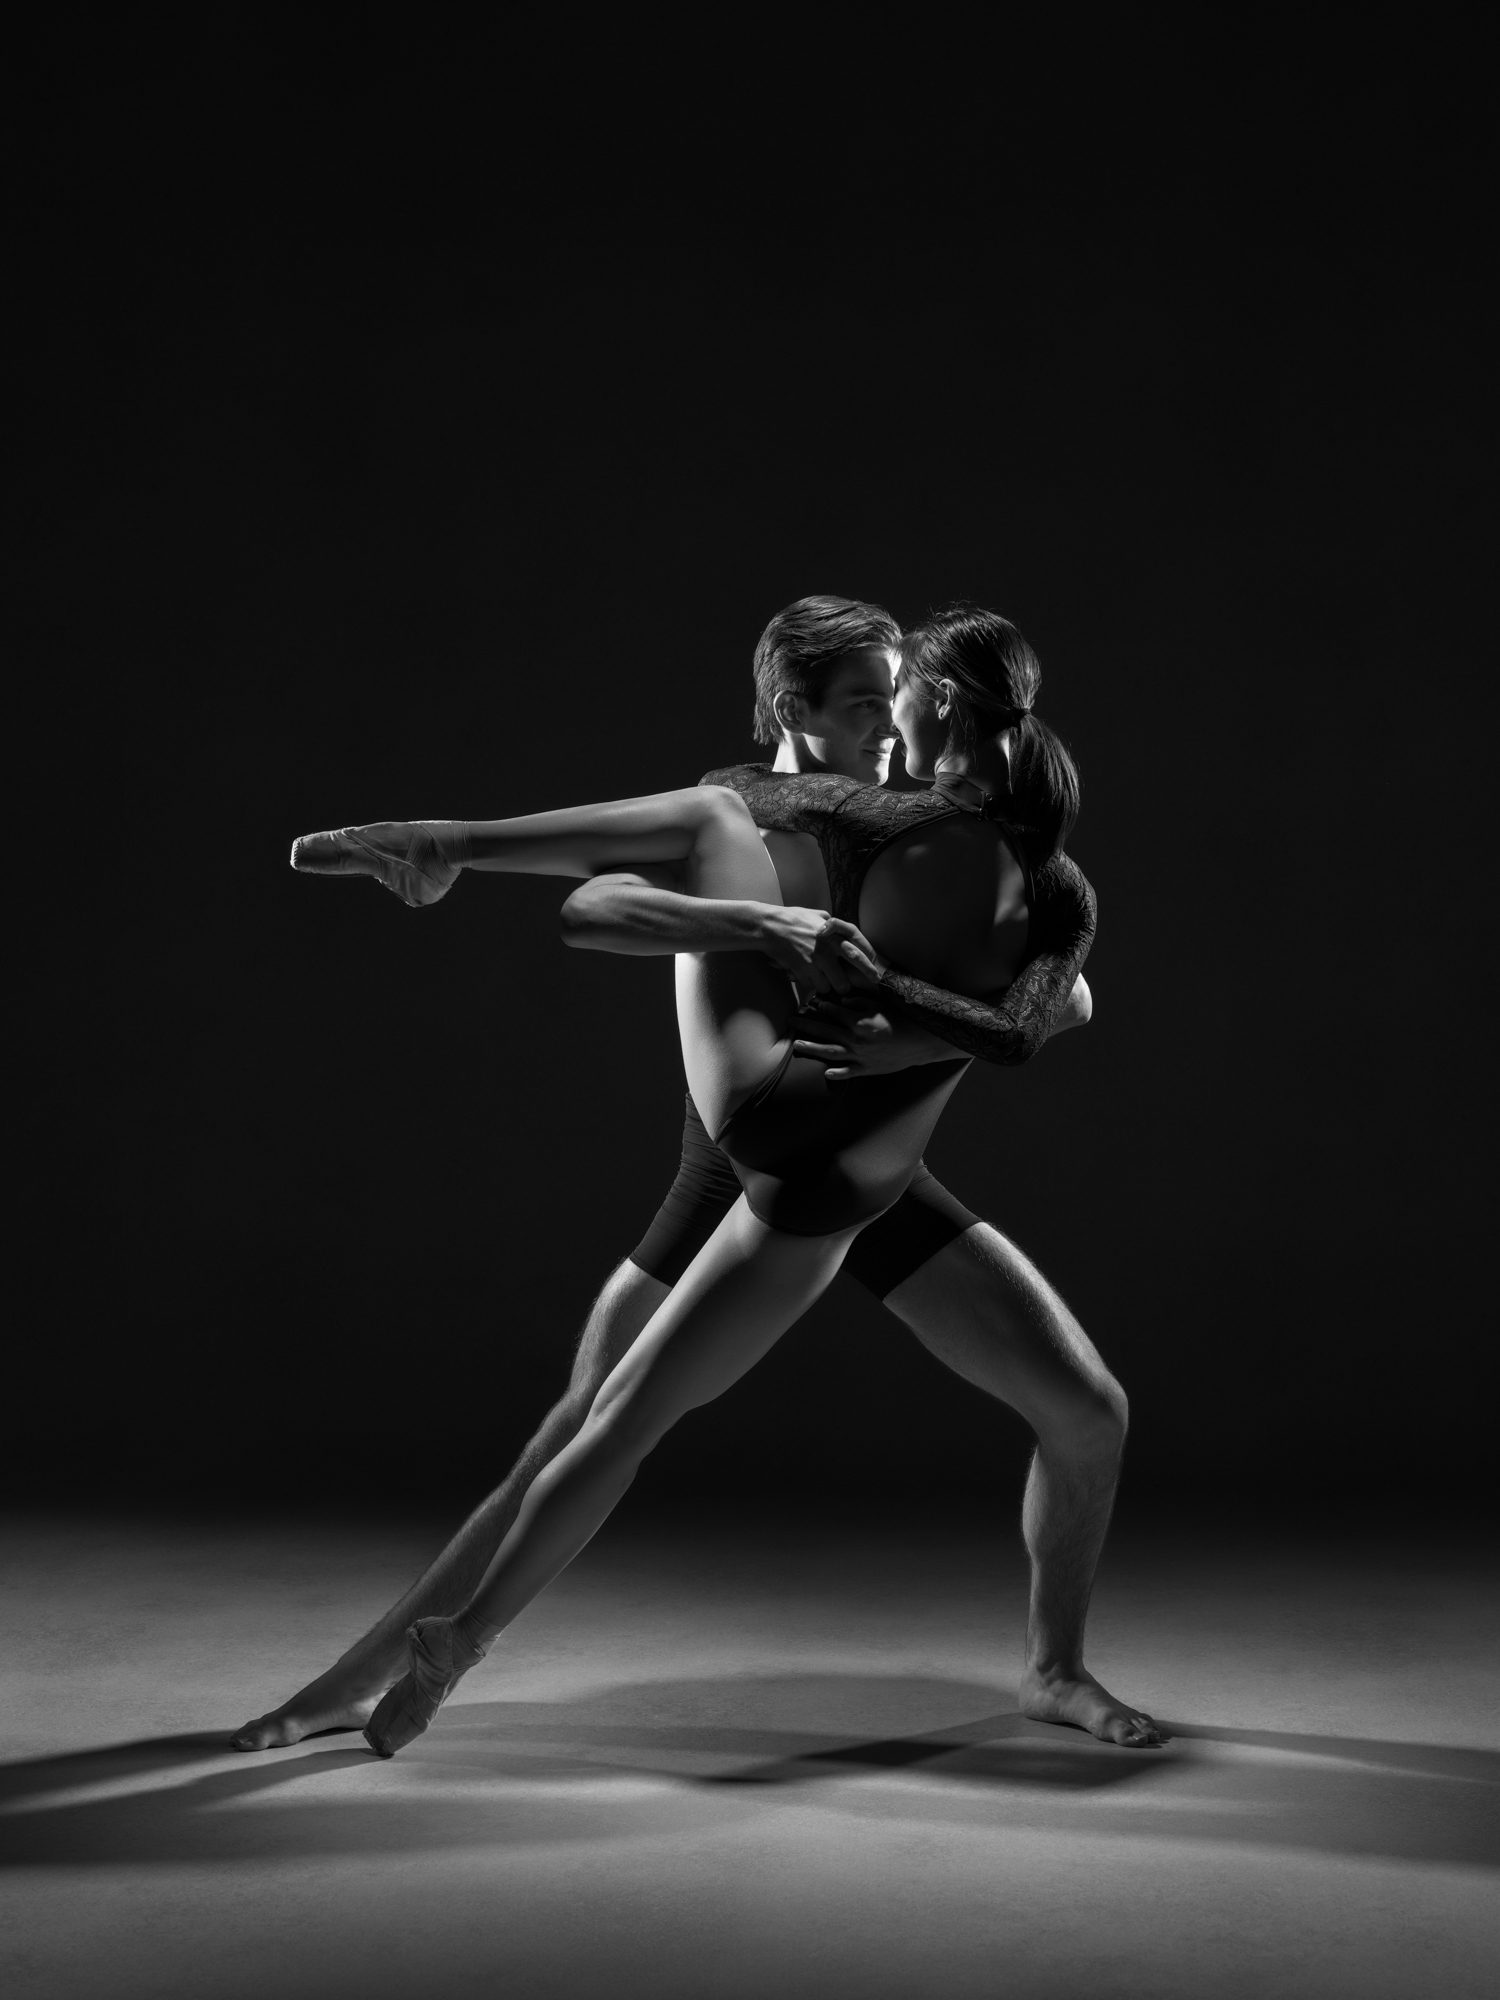 0113 Ruka & Enrico Dance Shoot Studio B_W.jpg